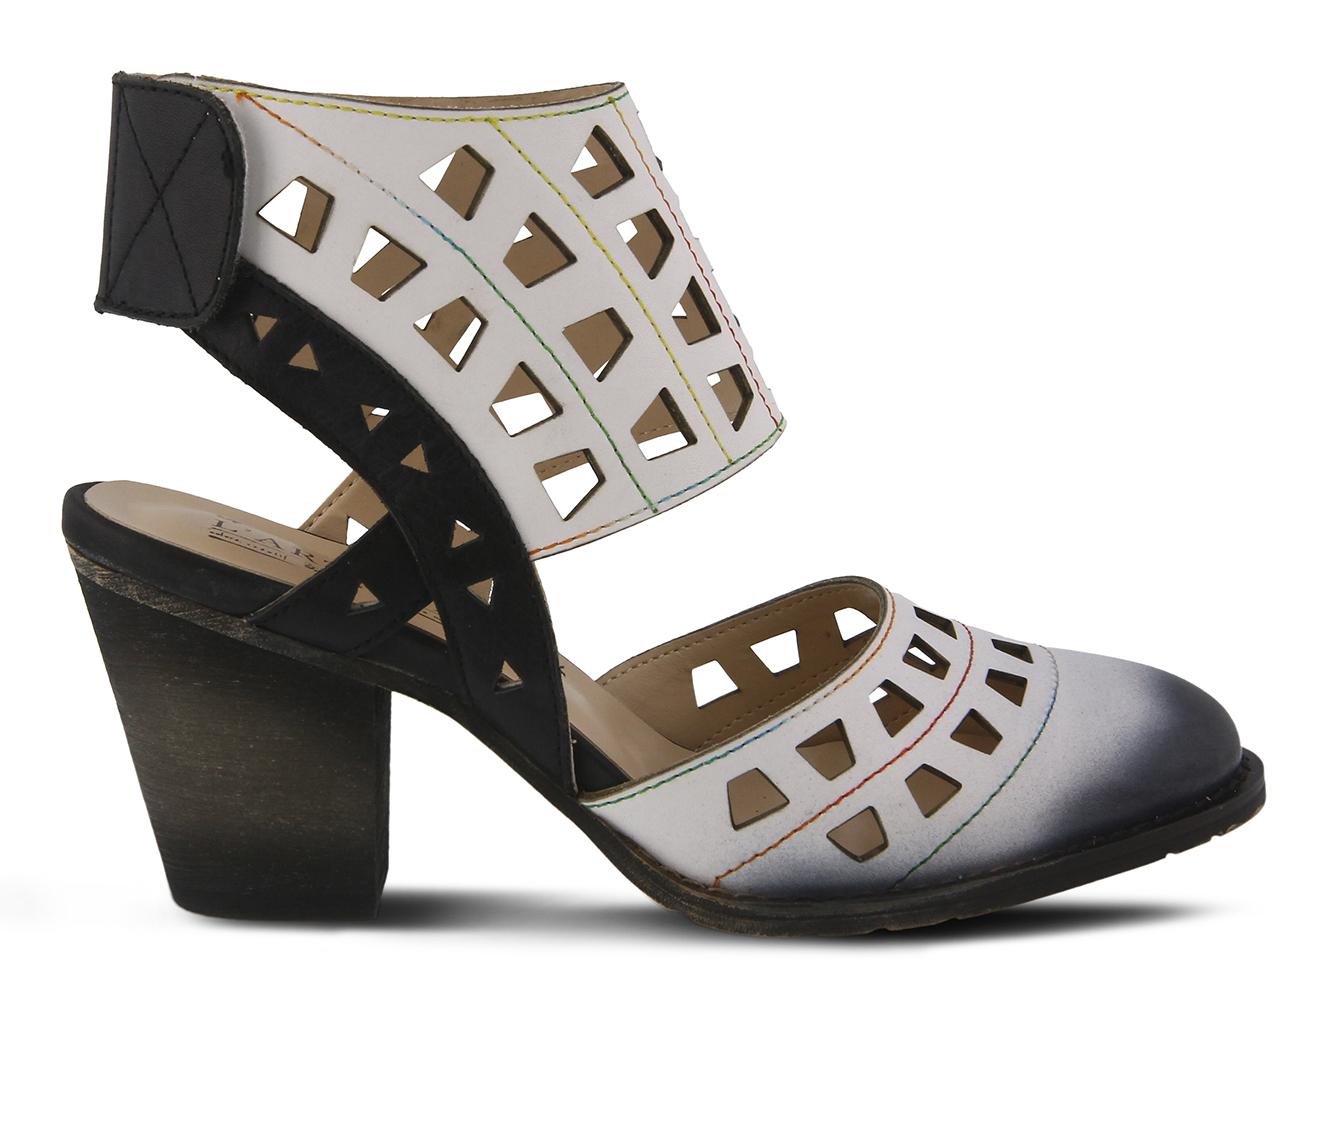 L'Artiste Distinctive Women's Dress Shoe (White Leather)